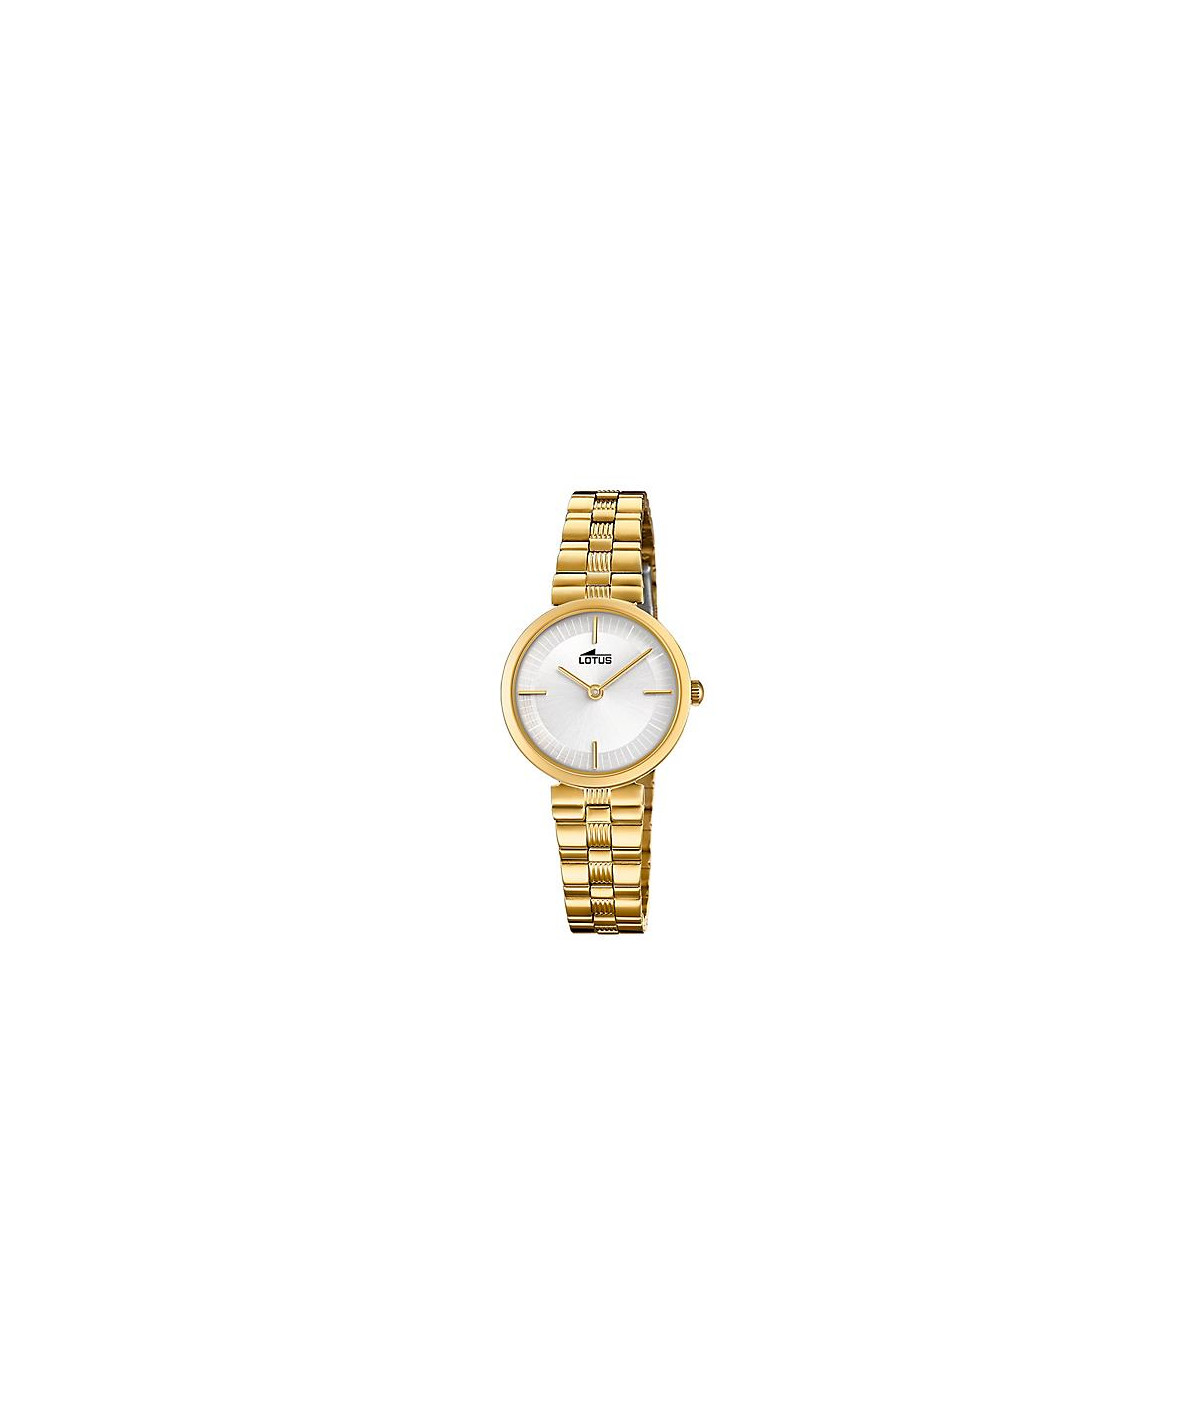 Reloj Marea, B32058-2, mujer, policarbonato carey - B3205802